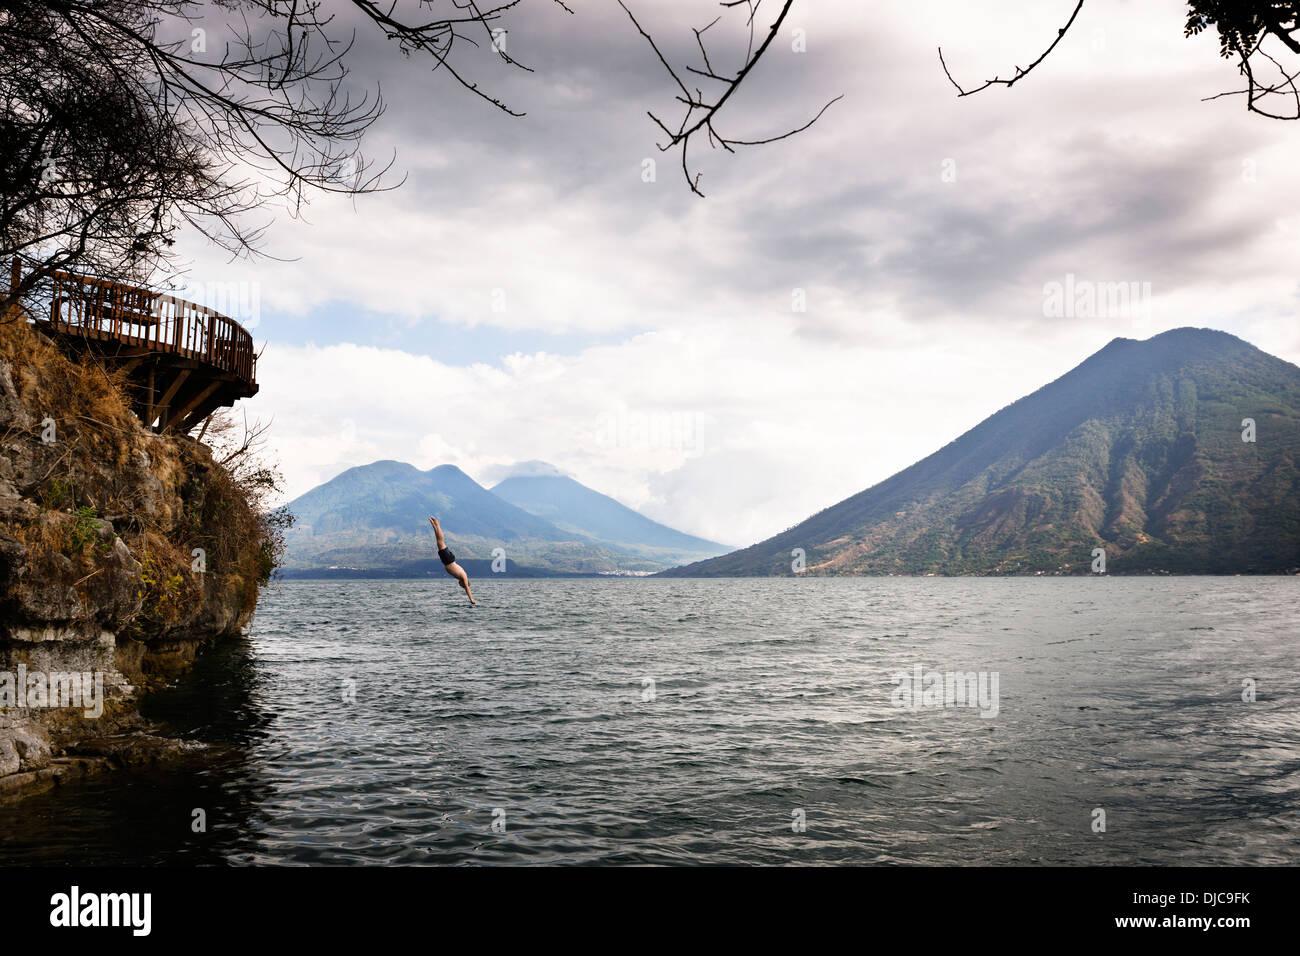 Diving off a platform into Lake Atitlán, Guatemala. - Stock Image